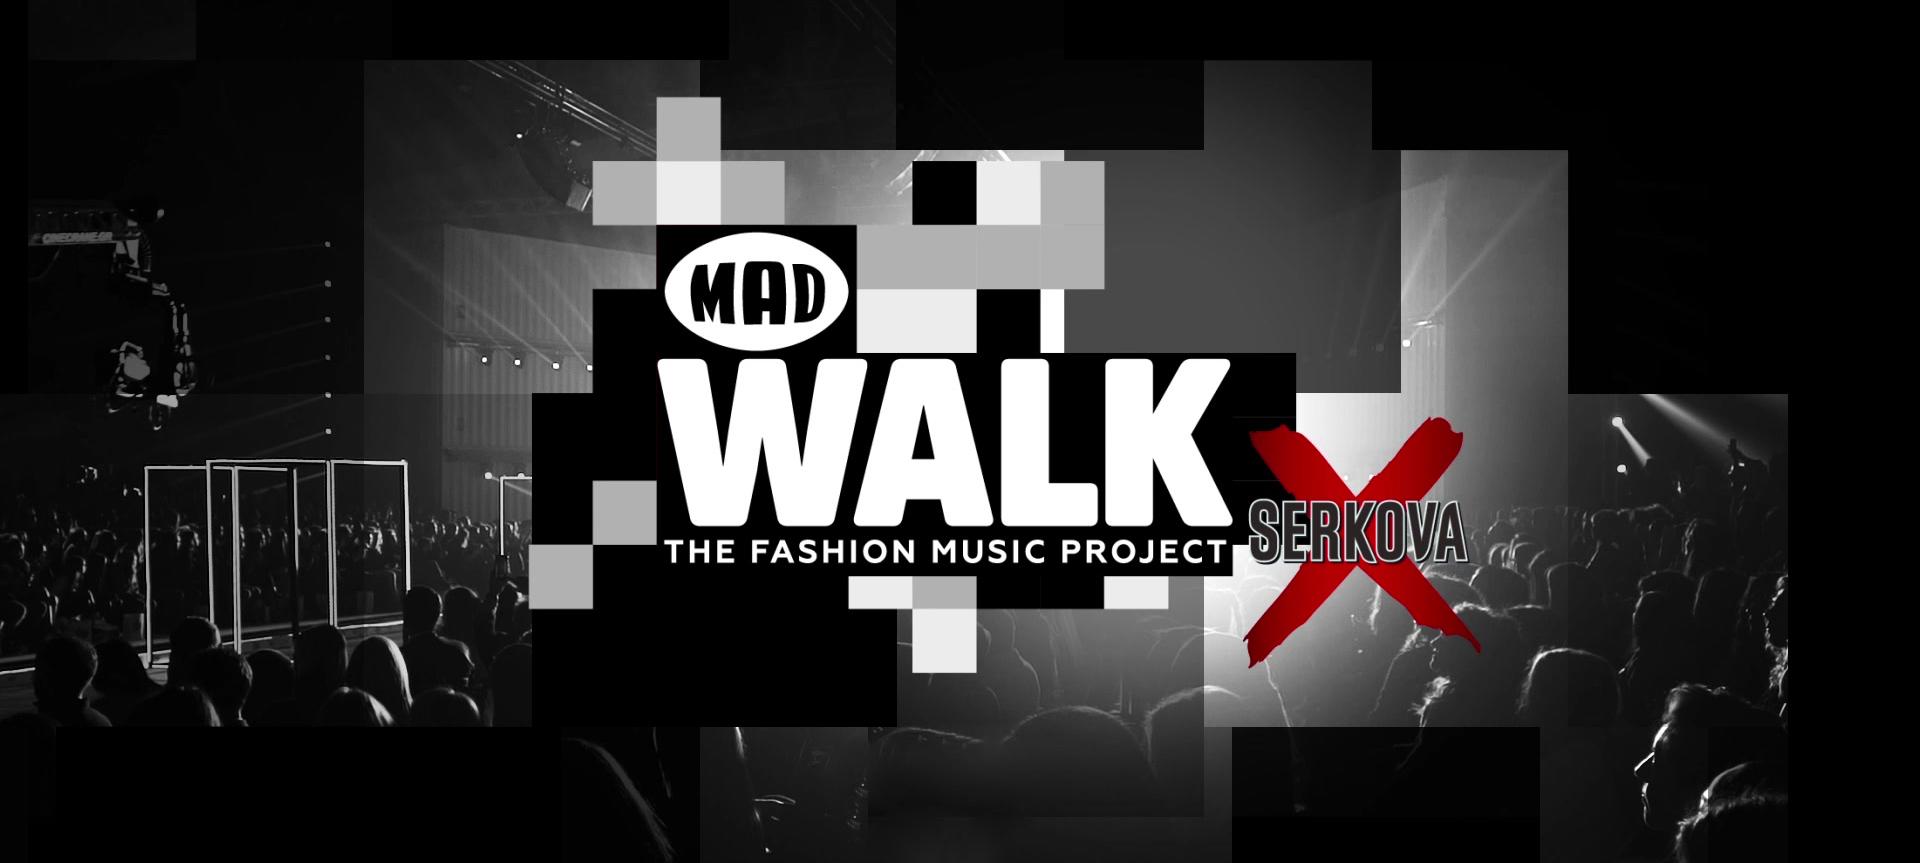 Mad Walk 2018 : compte rendu de la soirée